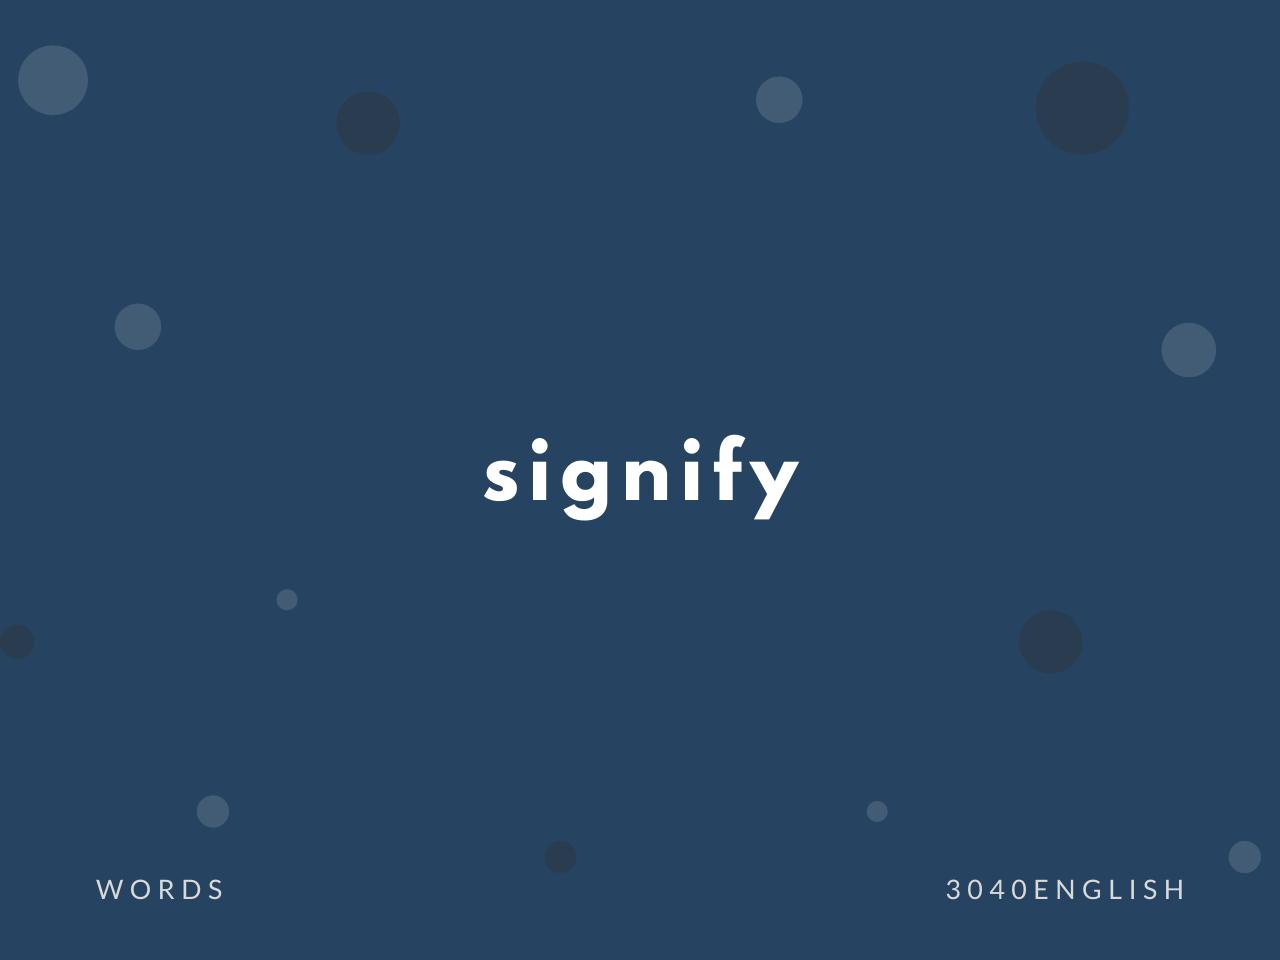 signify の意味と簡単な使い方【音読用例文あり】